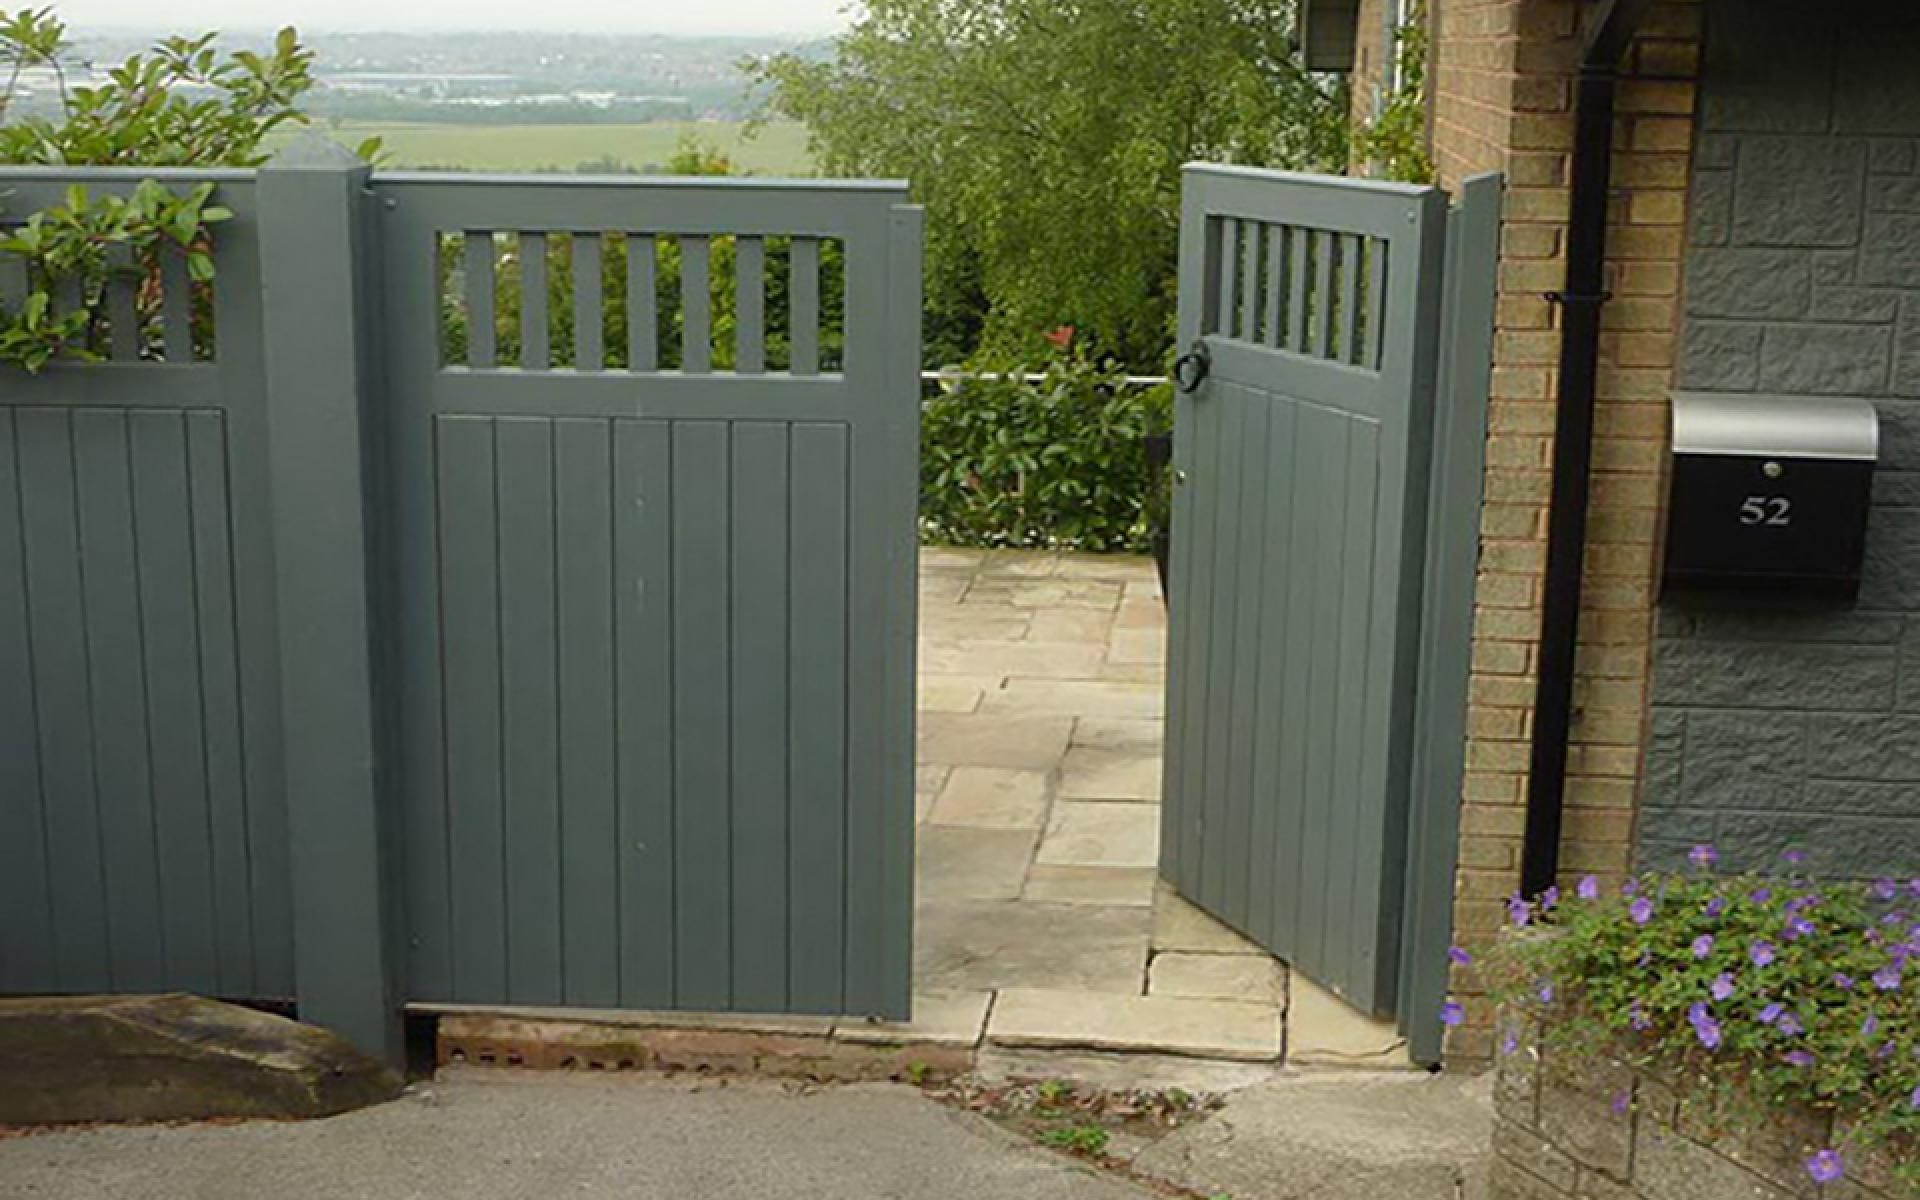 Incroyable Glittering Garden Gate Designs Wood For English Garden Gates Wood Look And  Astounding Garden Gates Wooden Manchester